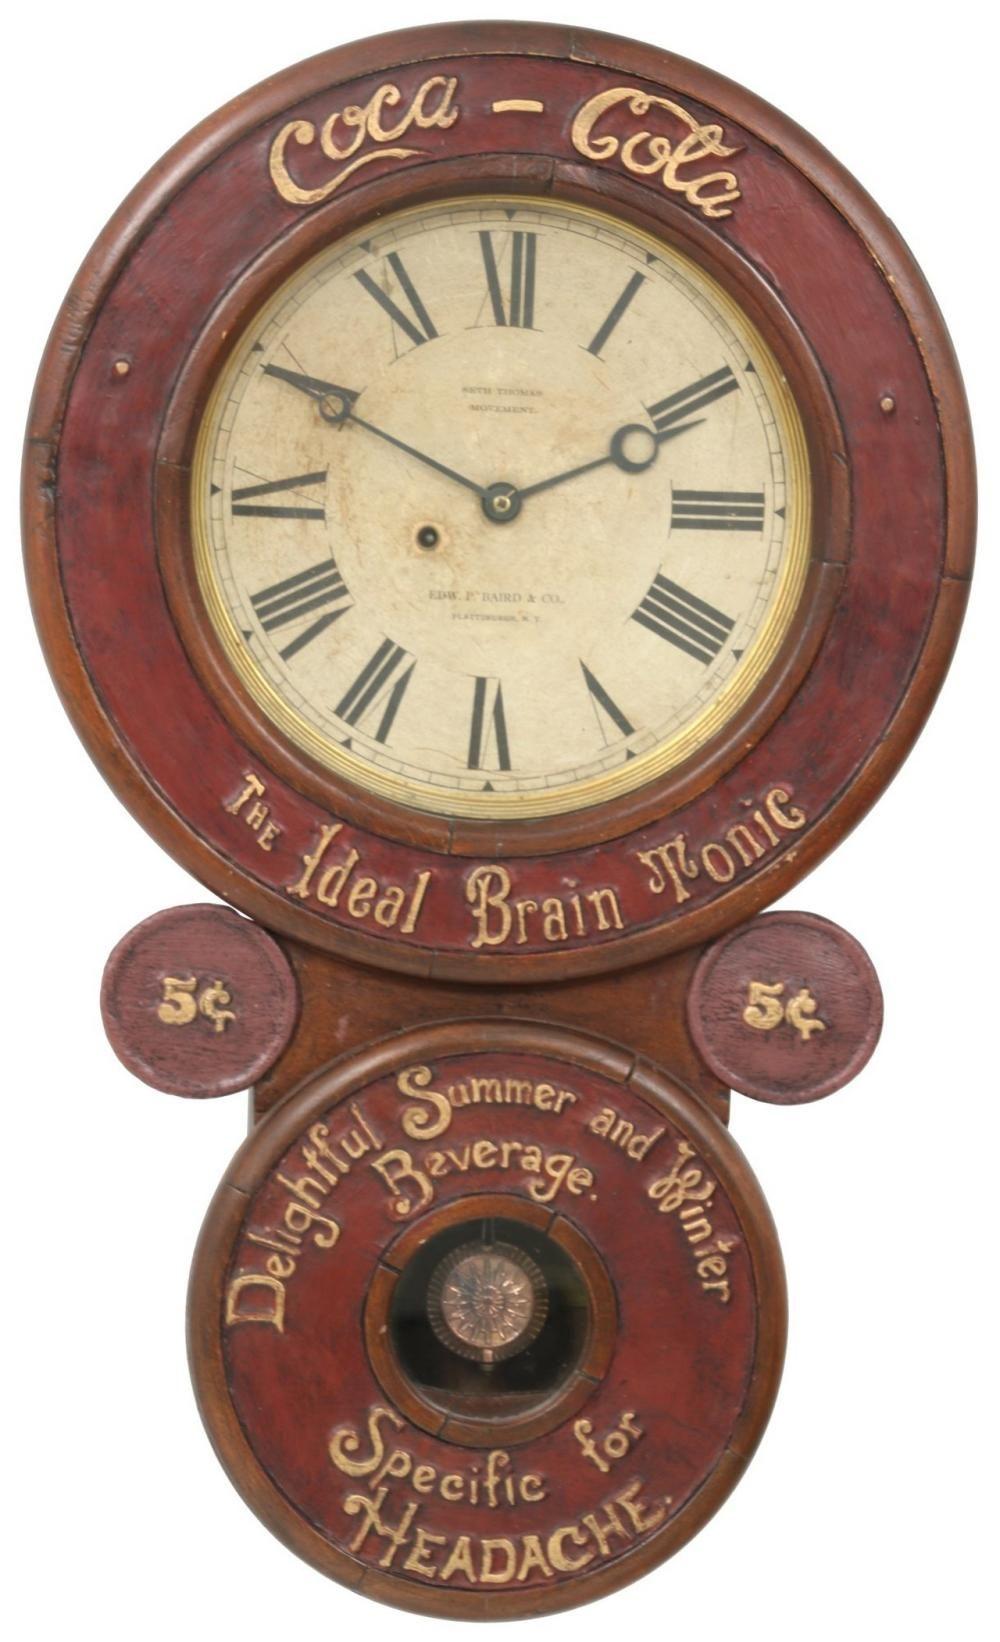 Miniature Shoe Polish Baird Advertising Clock Advertising Clocks Clock Antique Clocks